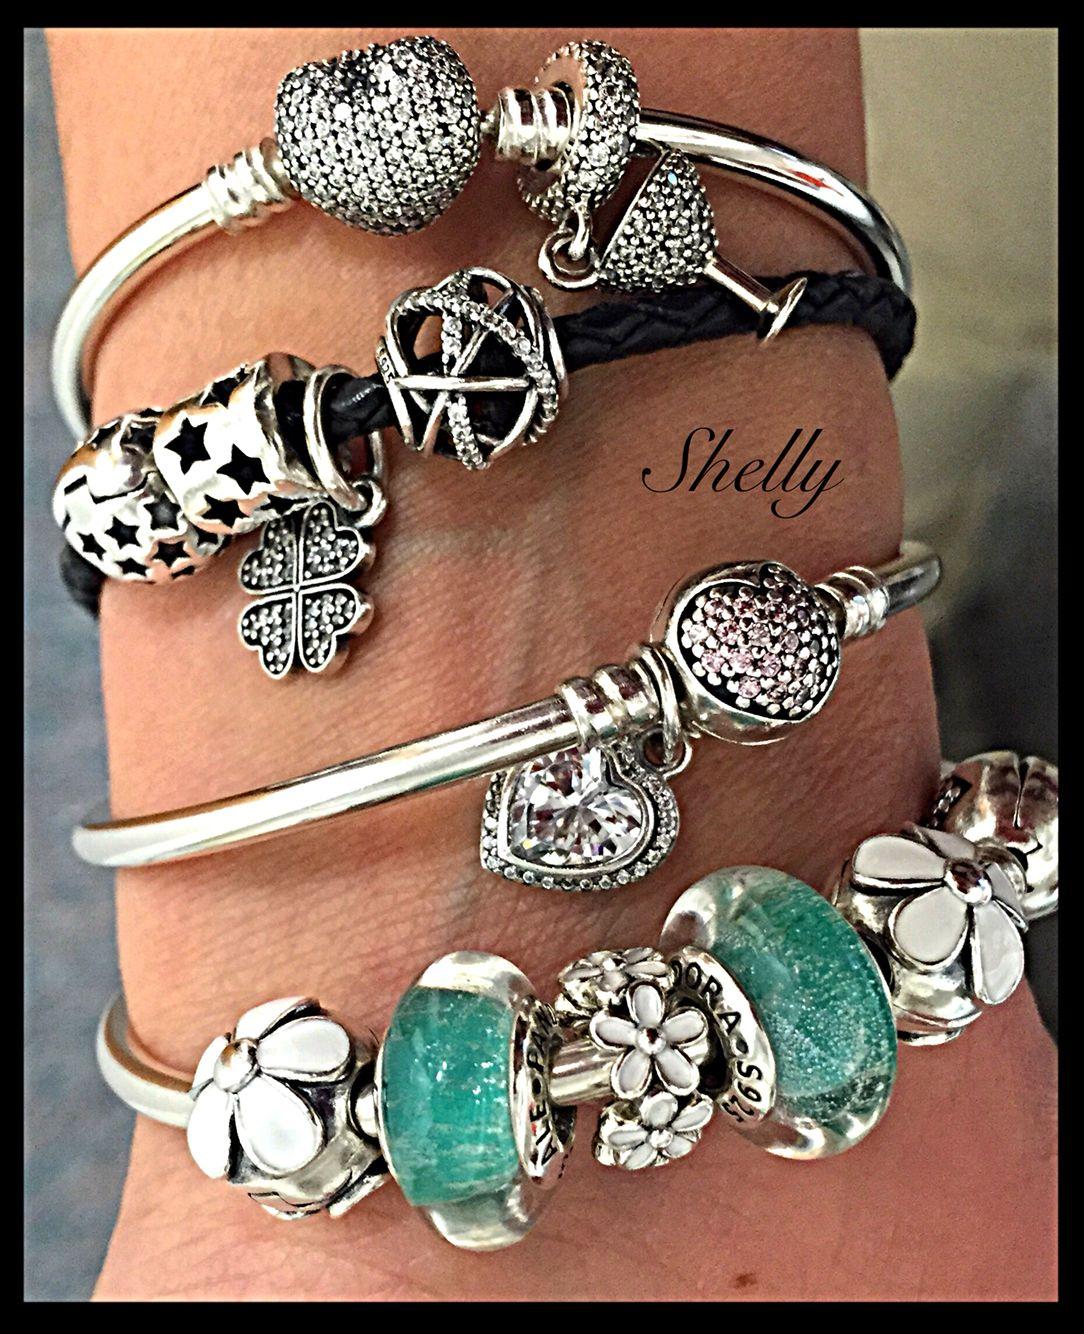 My stack | Pandora bracelet designs, Pandora jewelry, Pandora ...